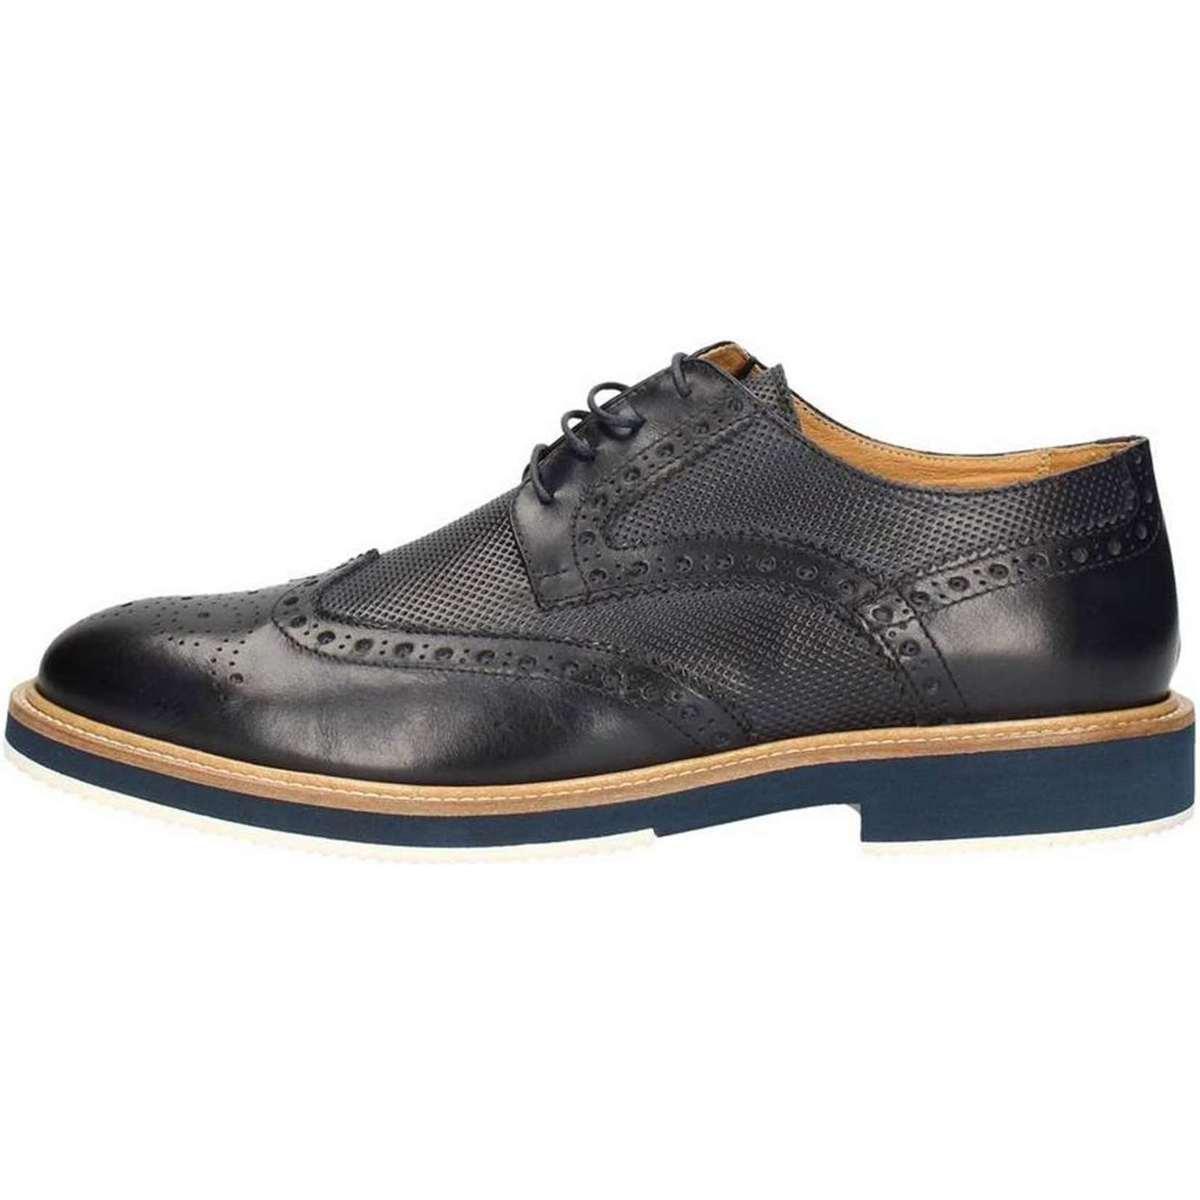 Hudson 917 Lace up shoes Mann Blau Blau - Schuhe Derby-Schuhe Herren 97,00 €